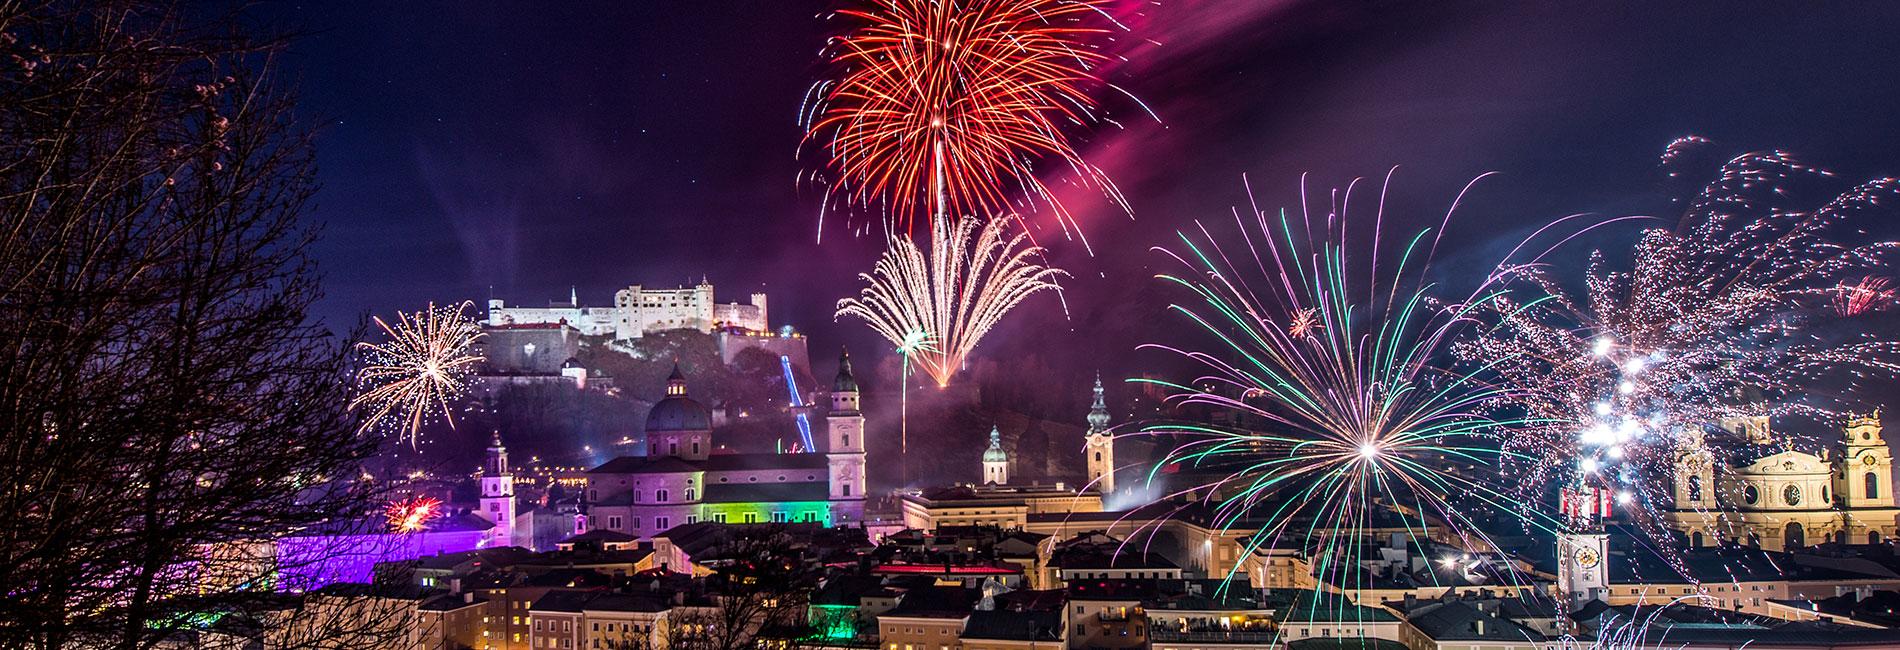 Salzburg Guide Tourismus - Silvester